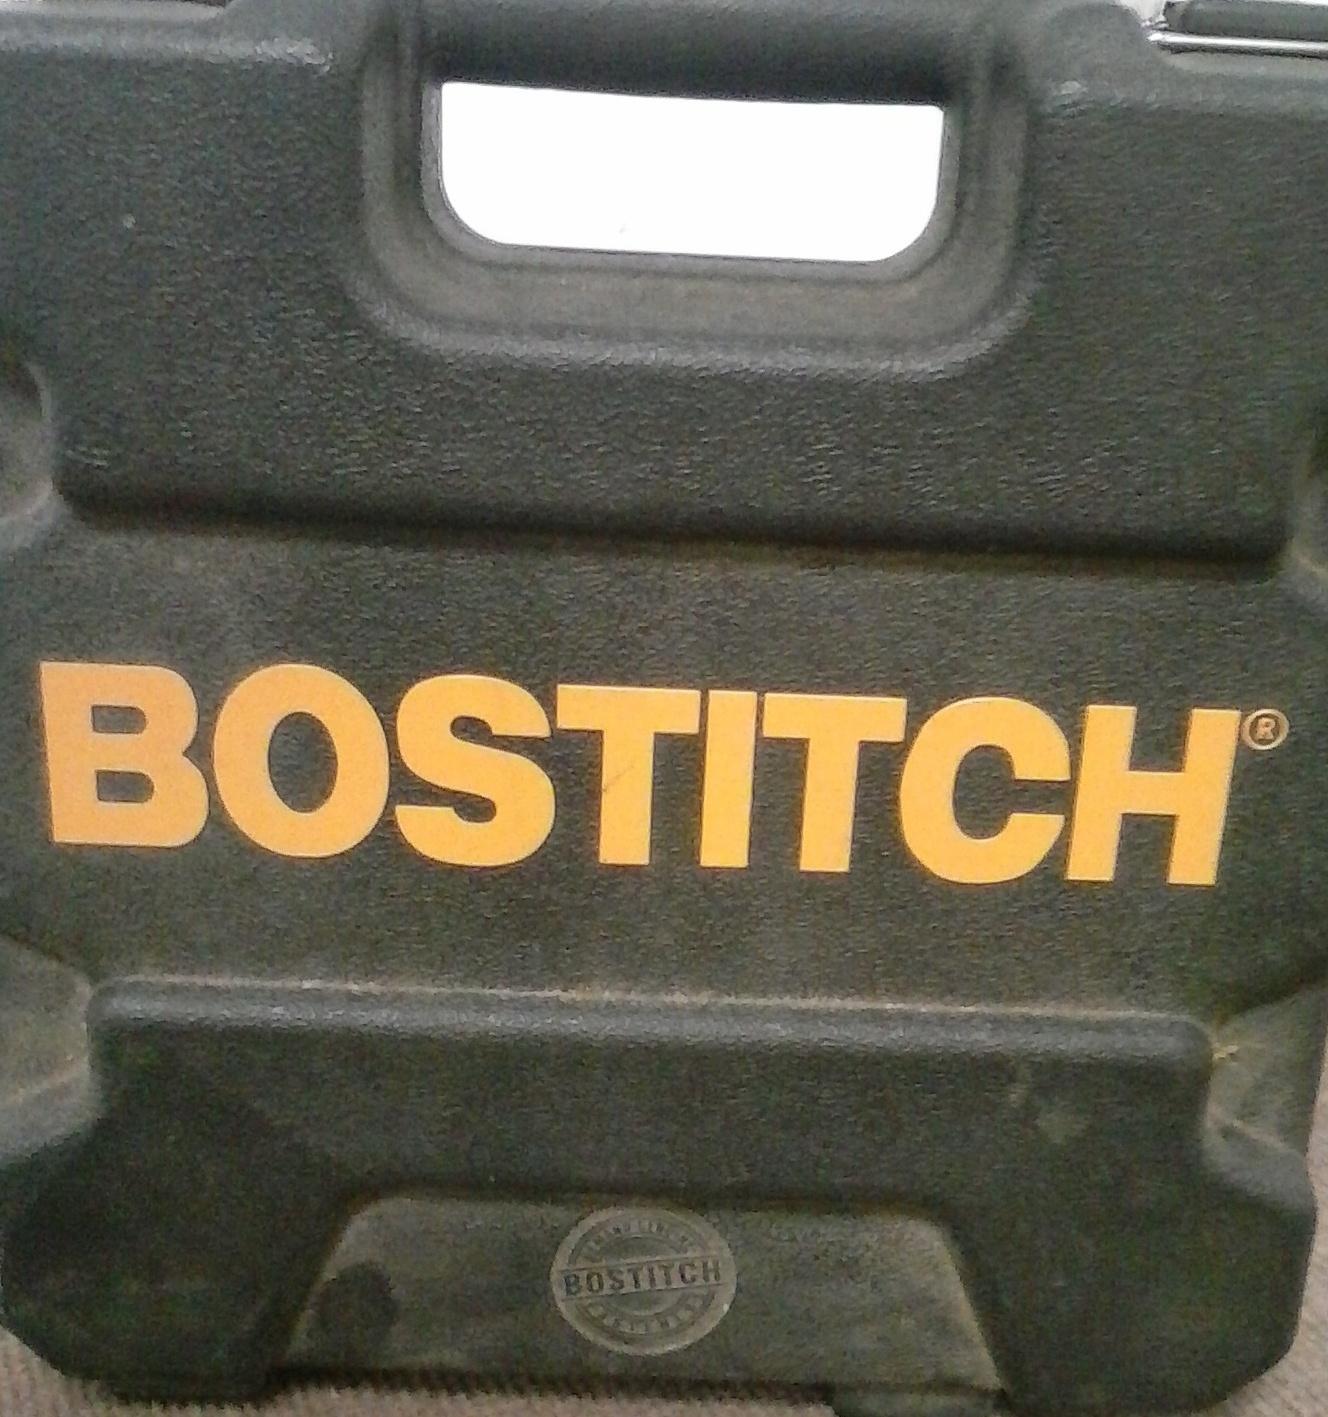 BOSTITCH - SX1838 - NAILGUN TOOLS